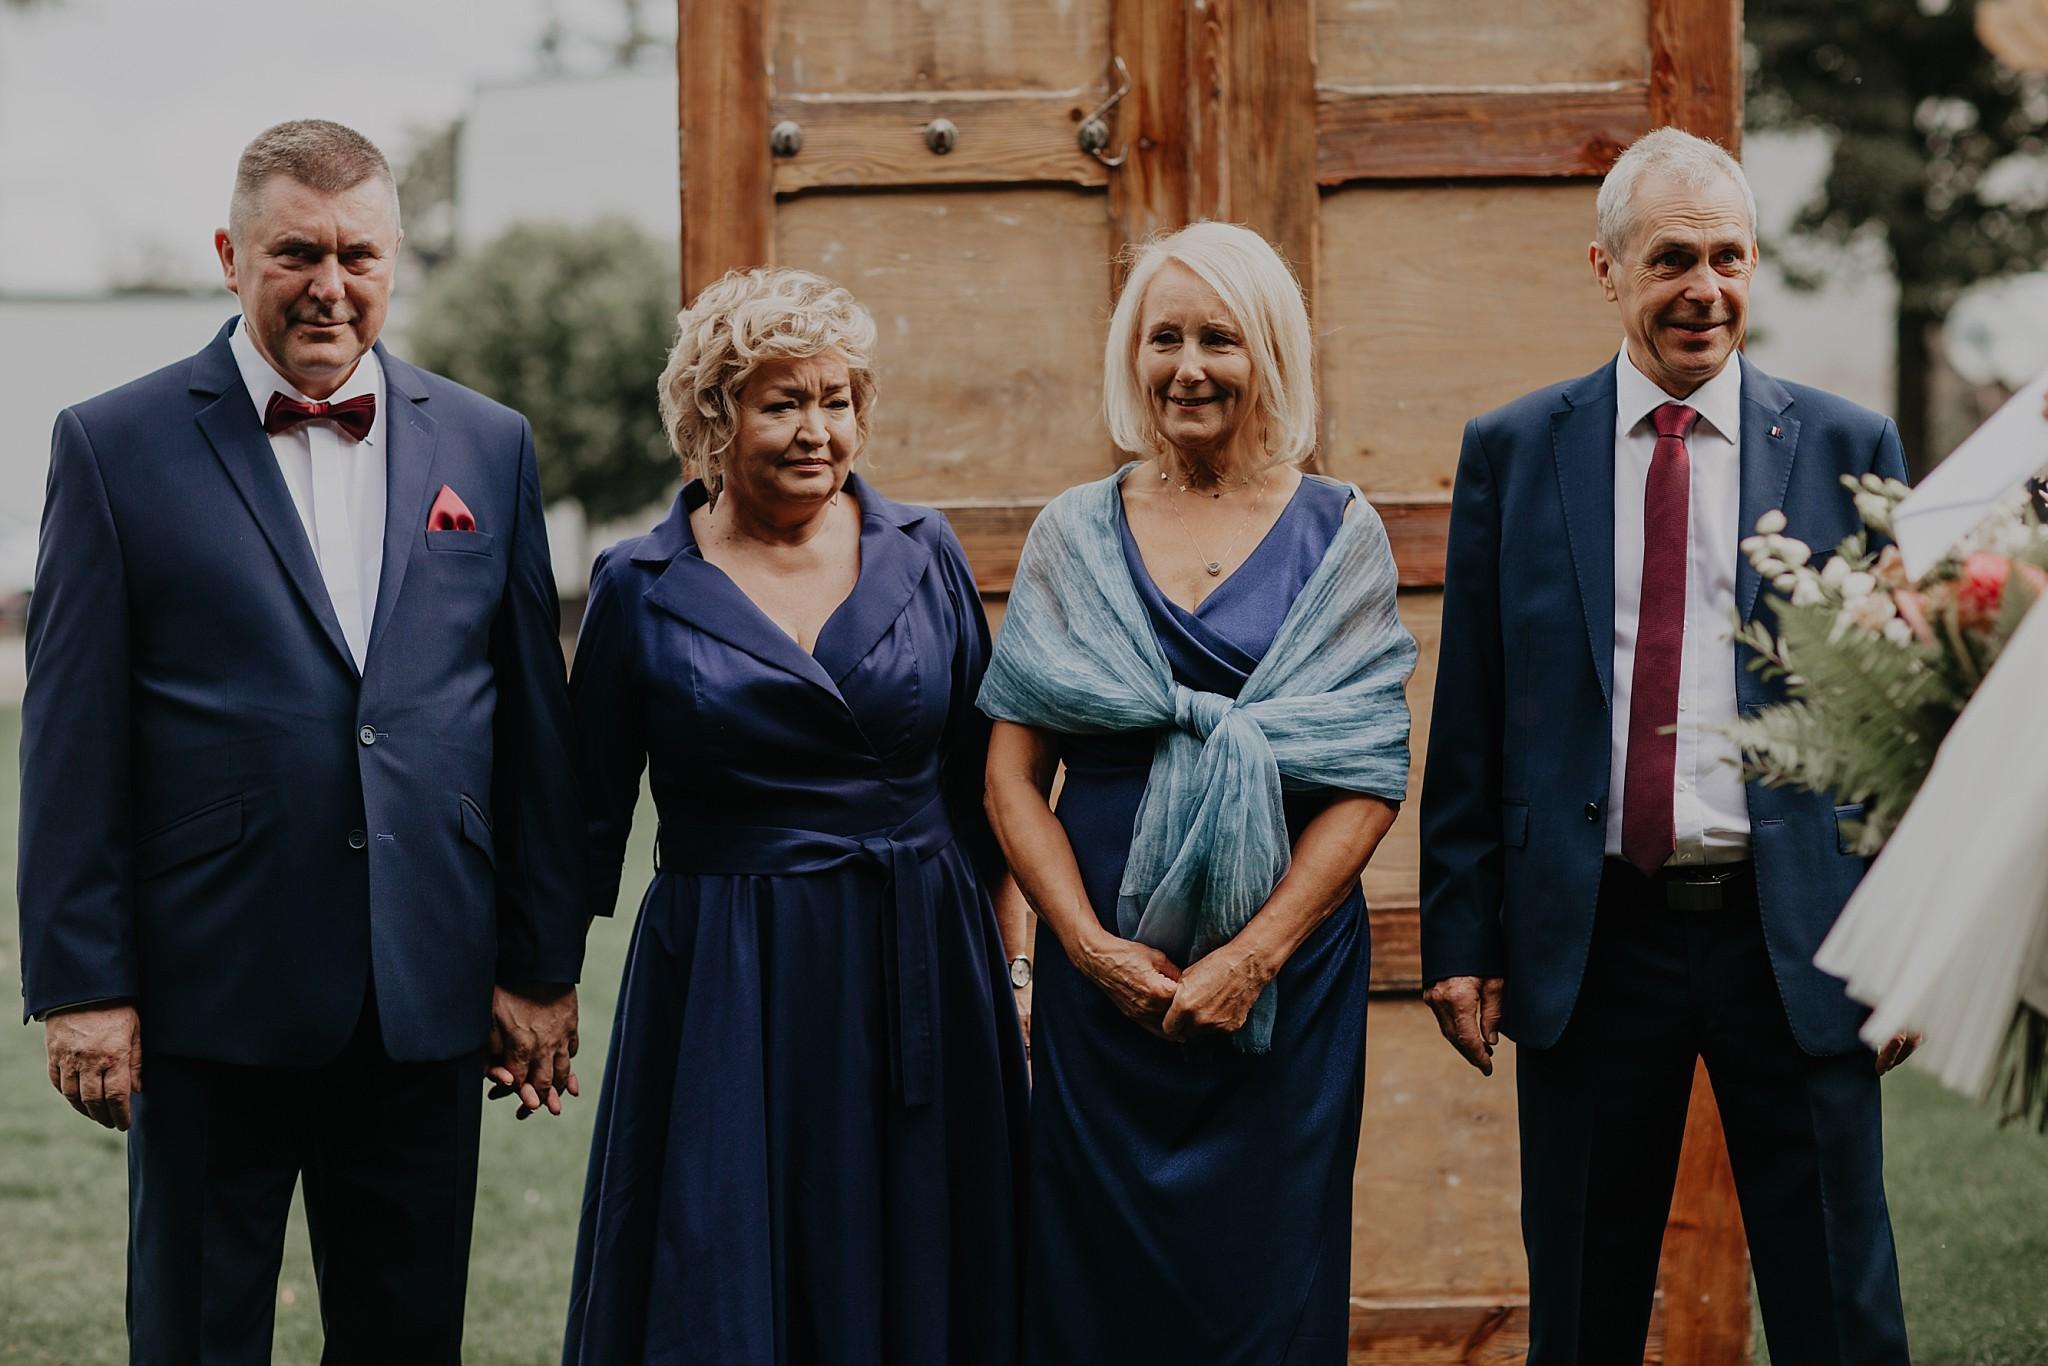 fotograf poznan wesele dobra truskawka piekne wesele pod poznaniem wesele w dobrej truskawce piekna para mloda slub marzen slub koronawirus slub listopad wesele koronawirus 097